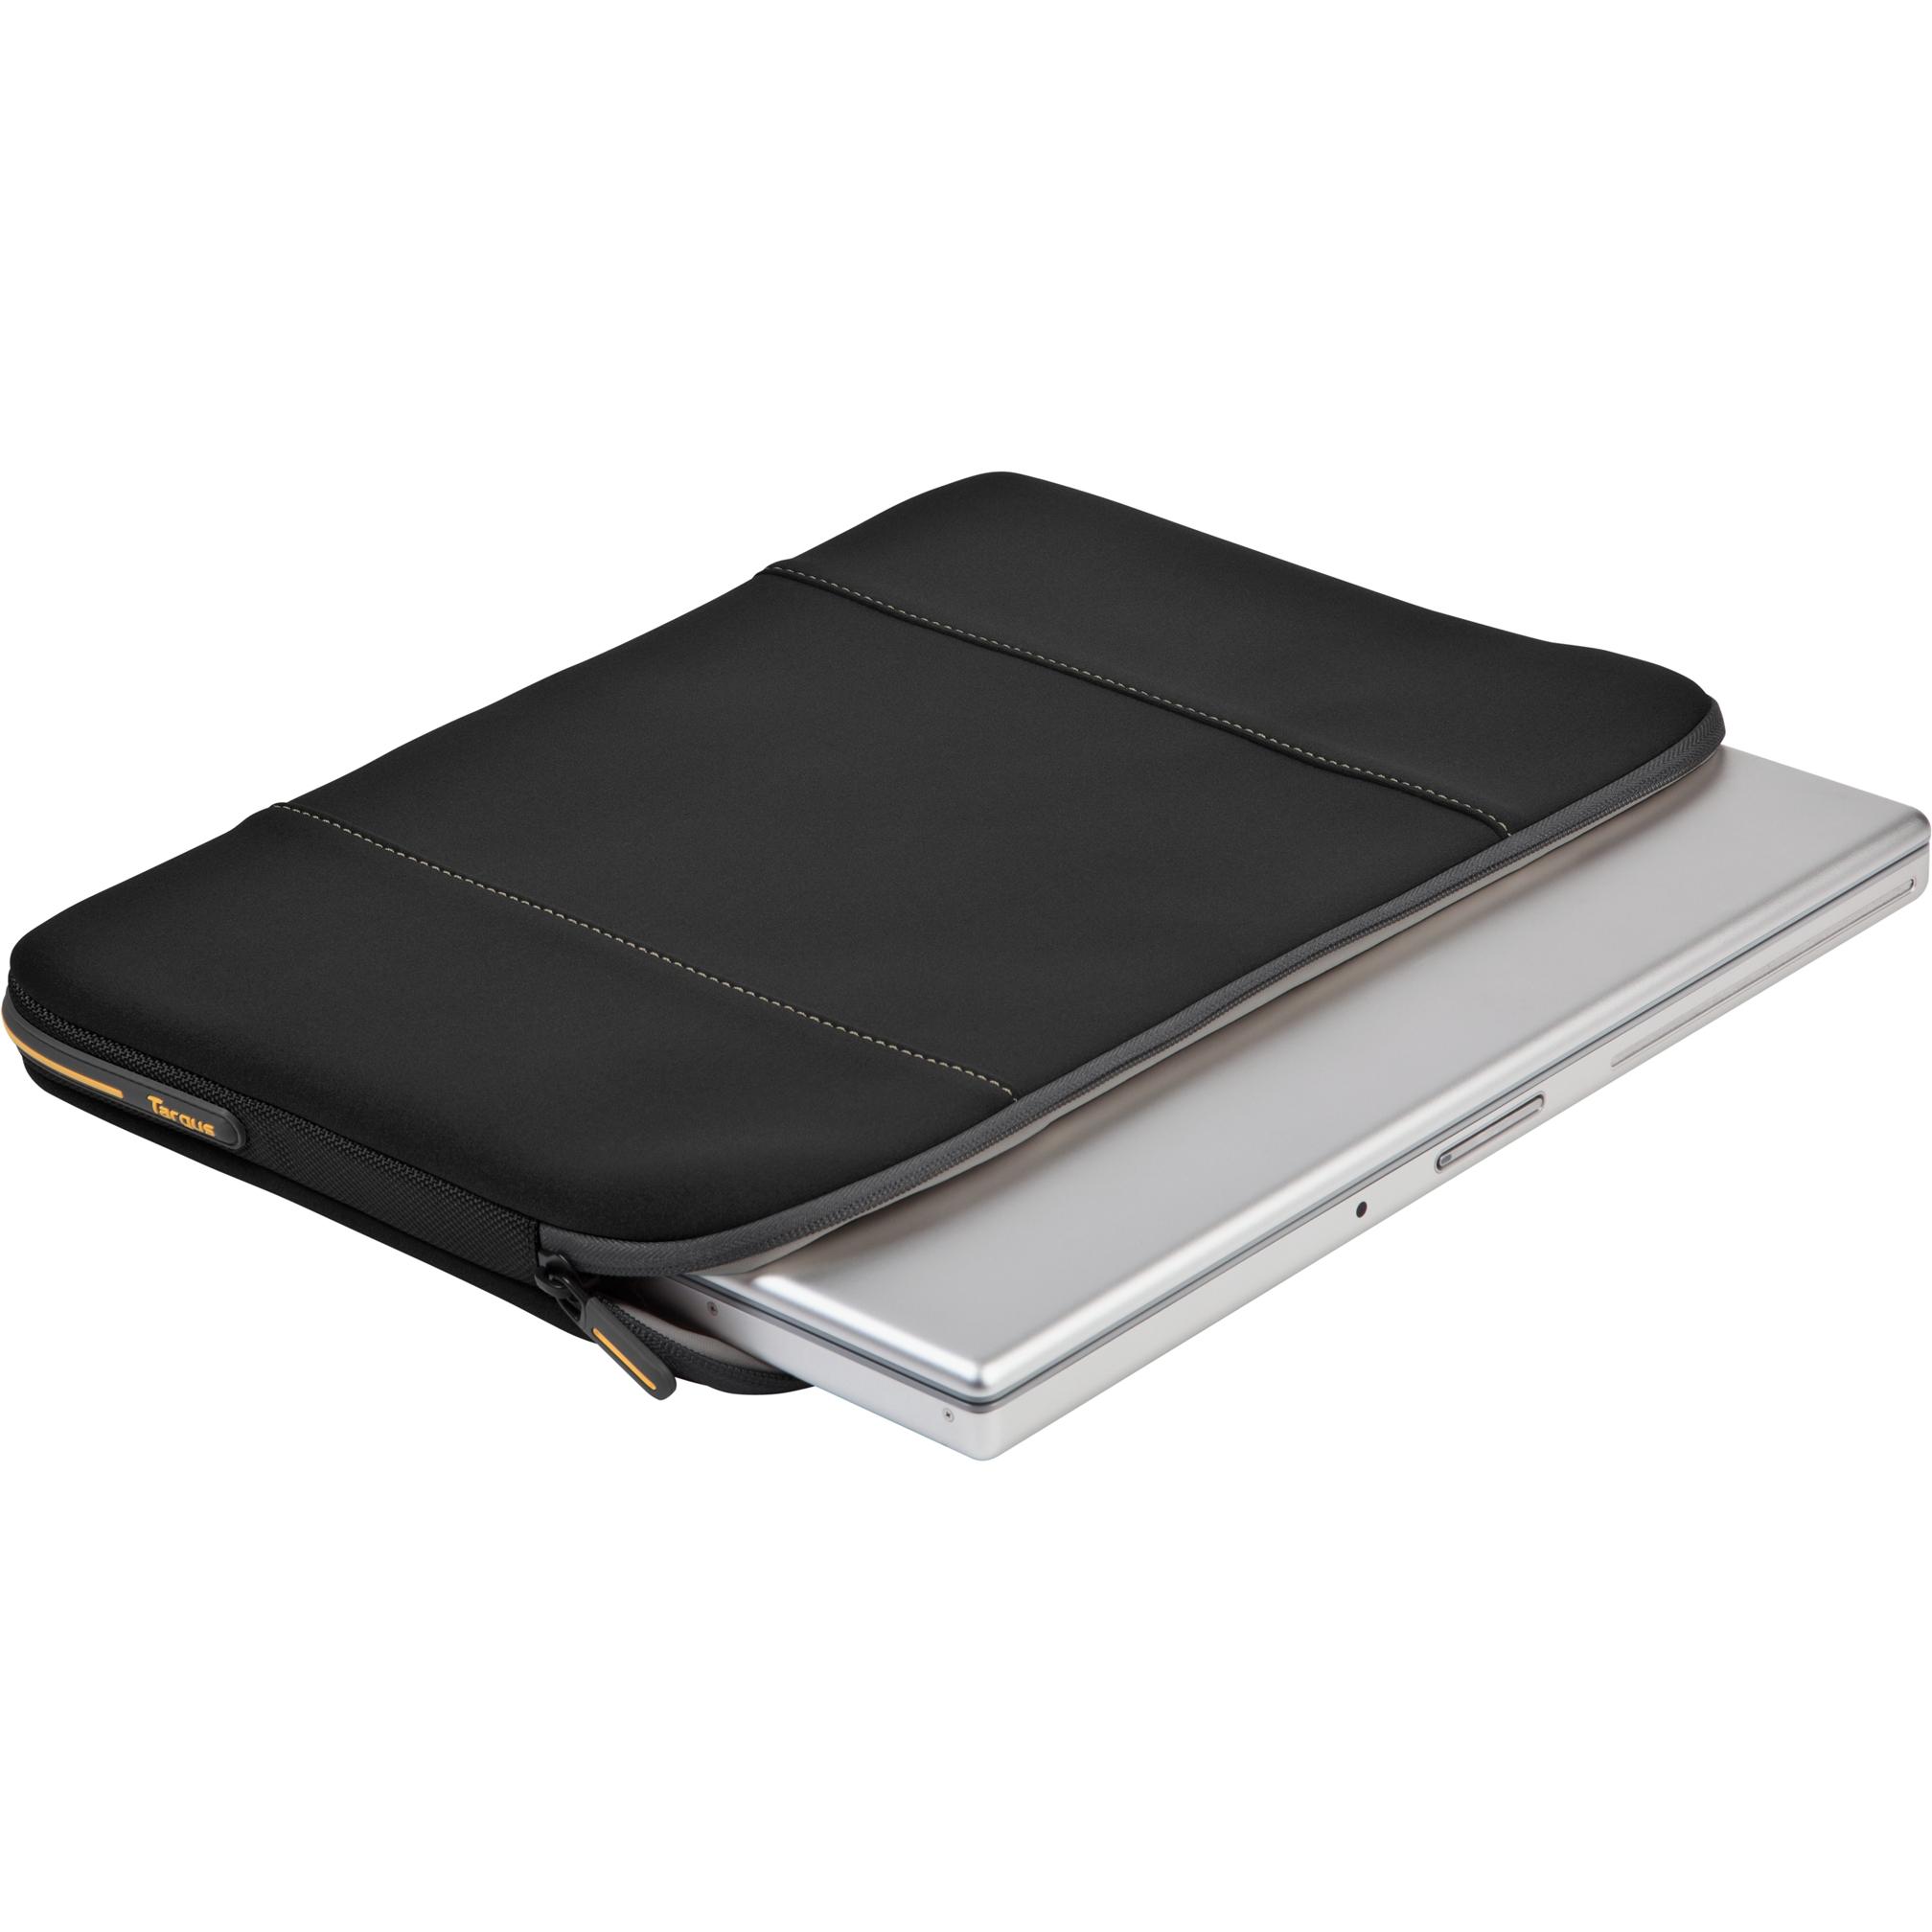 impax sleeve for 17 macbook pro tss278us black sleeves targus. Black Bedroom Furniture Sets. Home Design Ideas